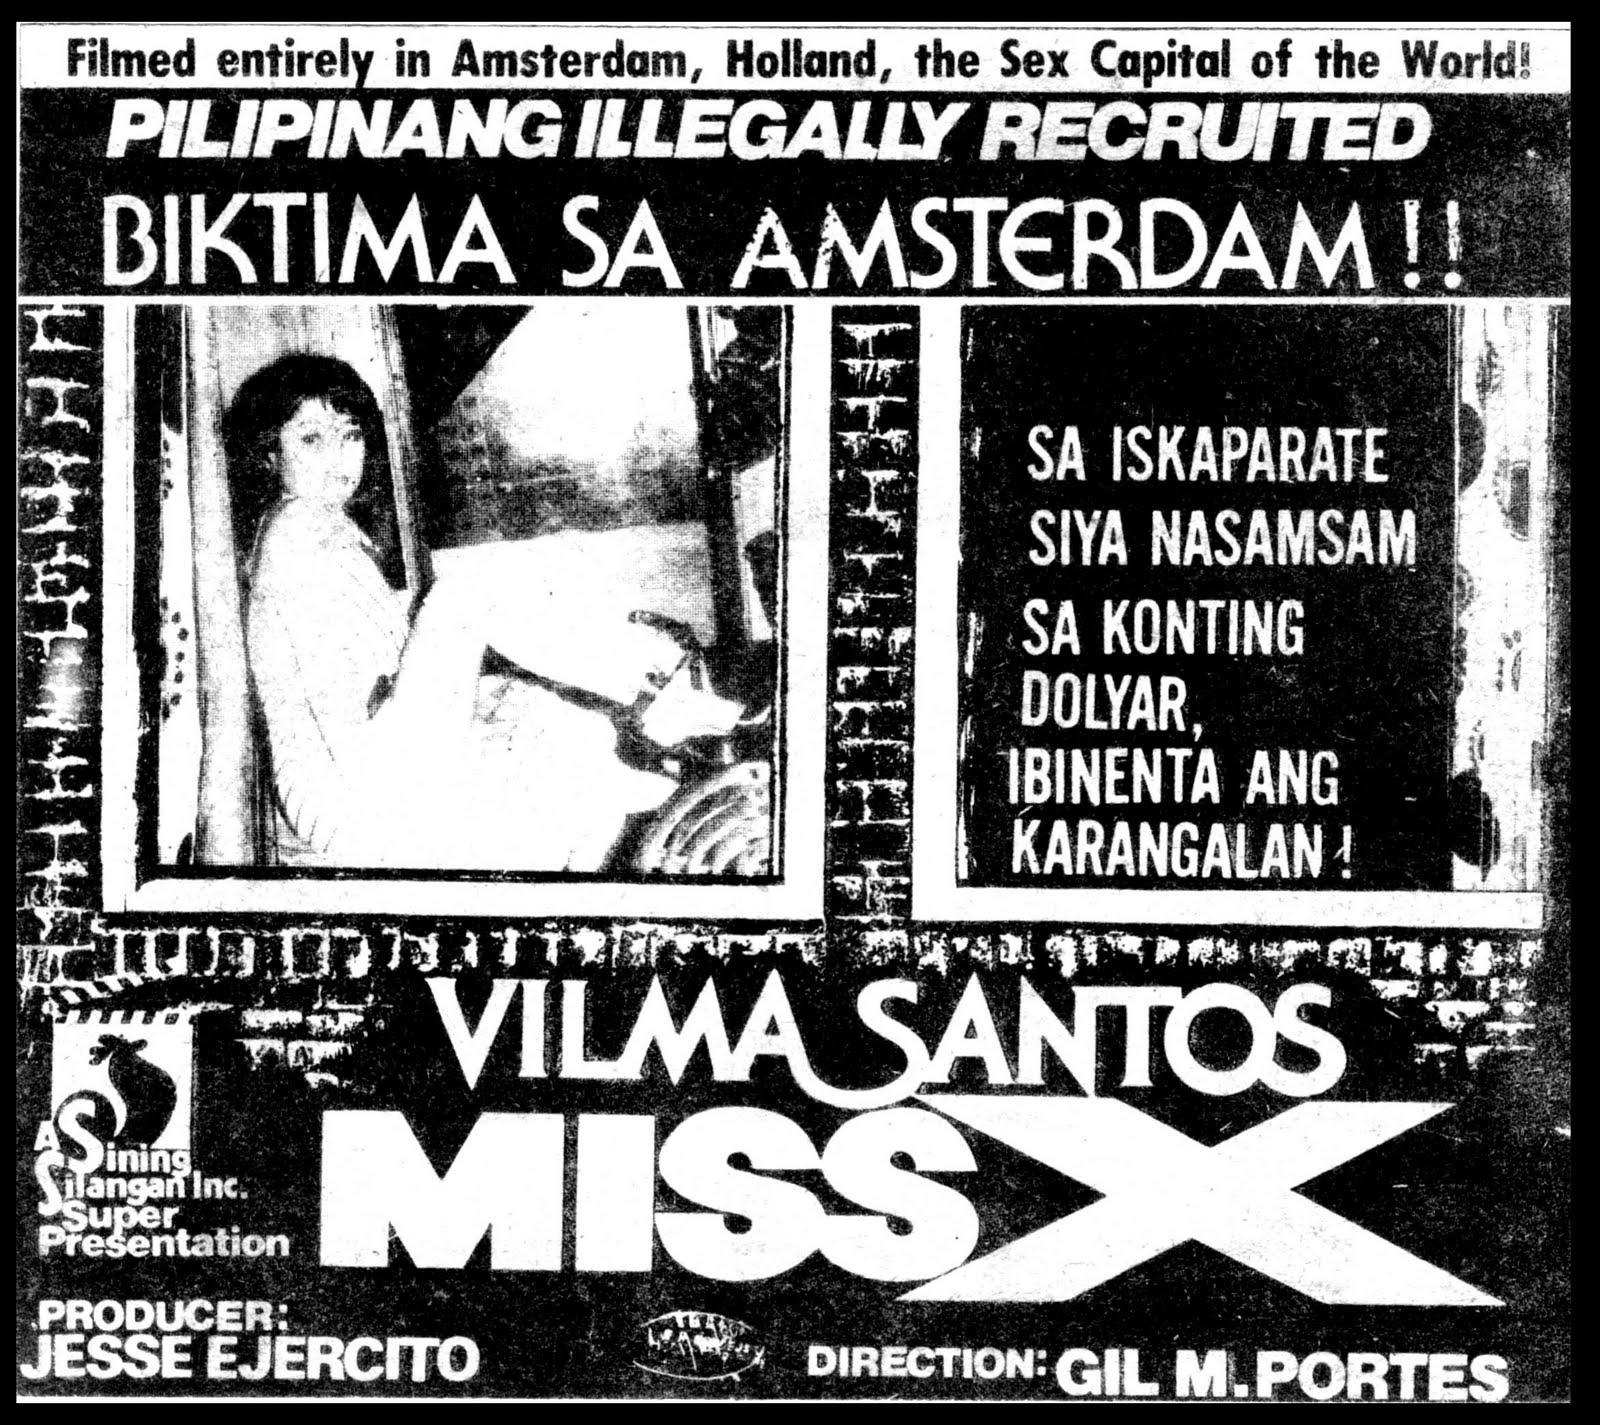 images Vilma Santos (b. 1953)